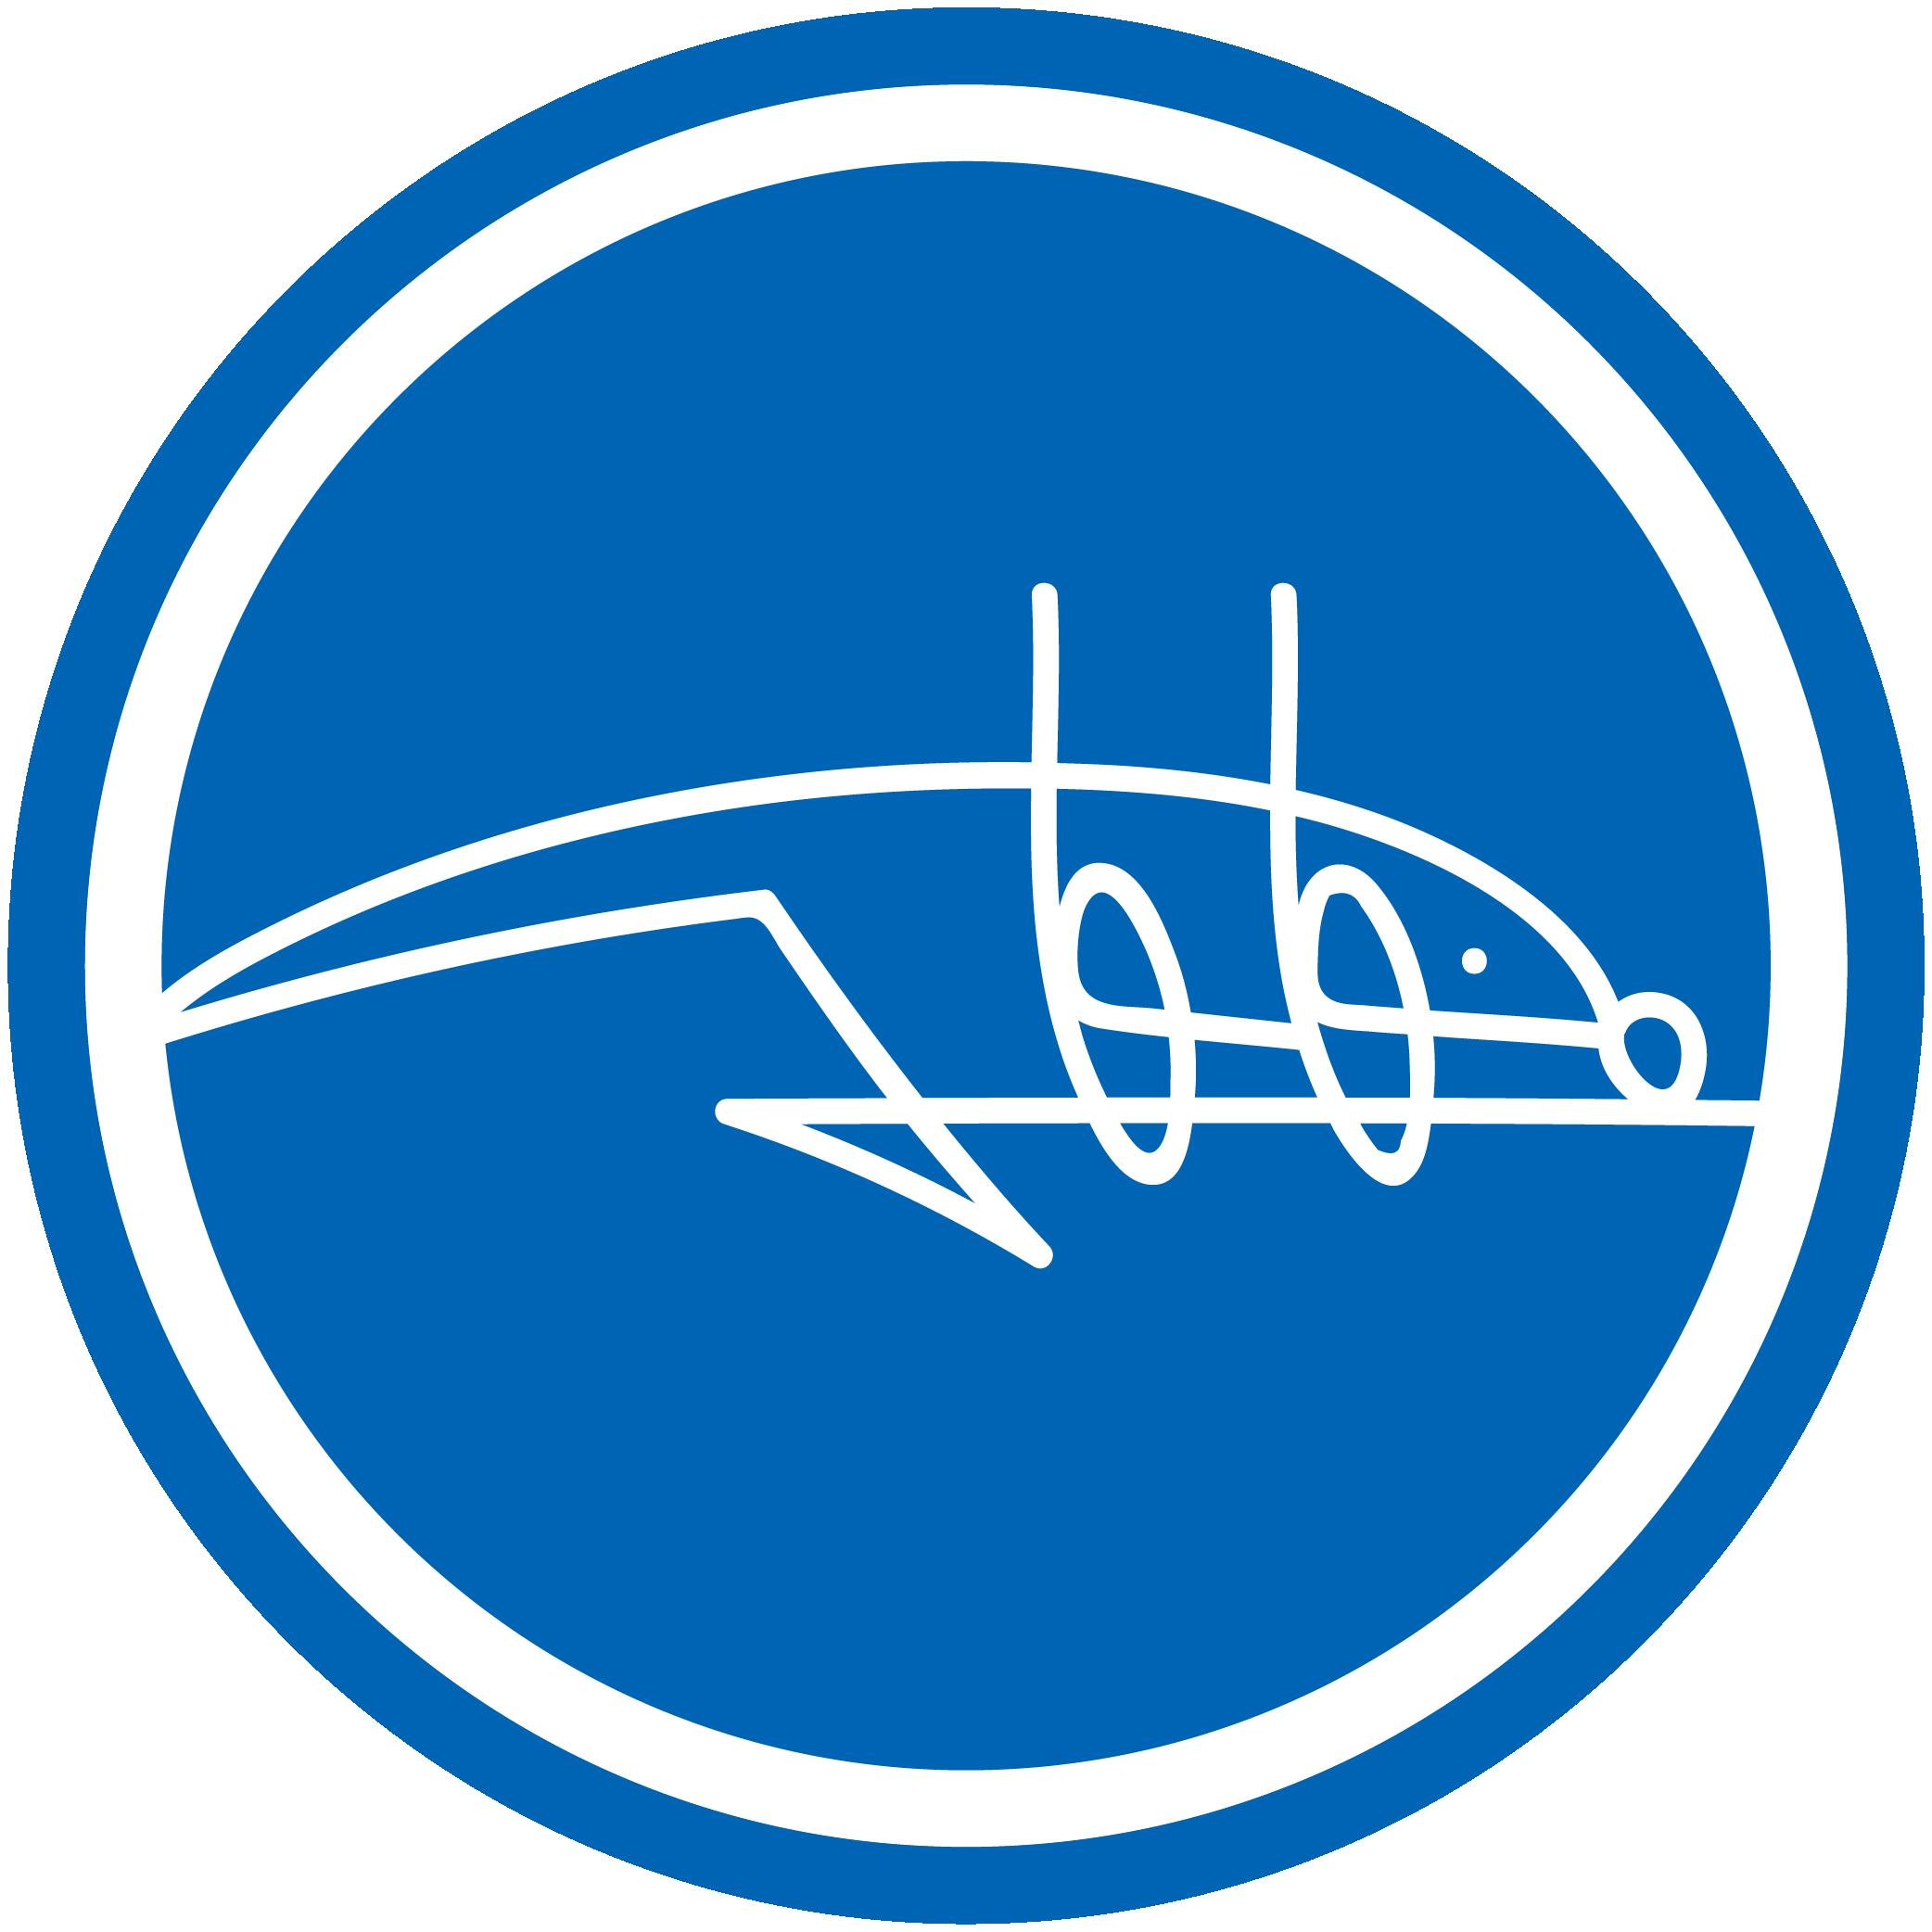 Icona design